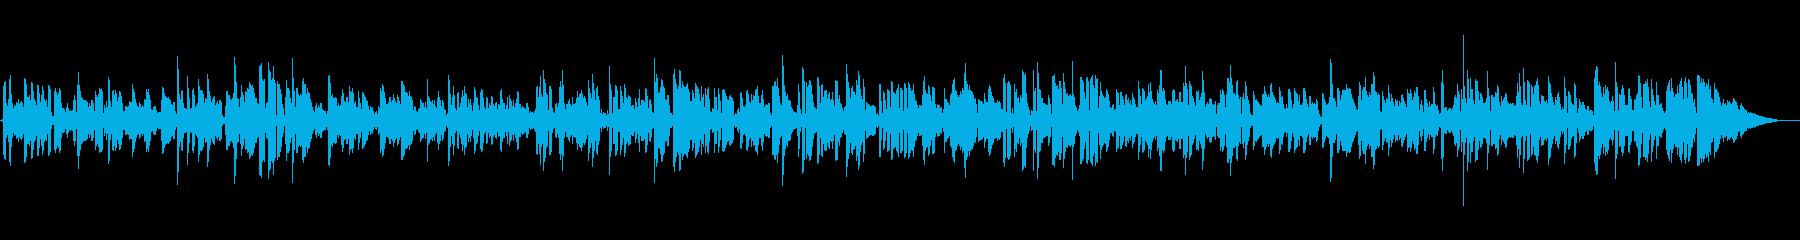 BGM|しっとり聴きたいお洒落ジャズの再生済みの波形